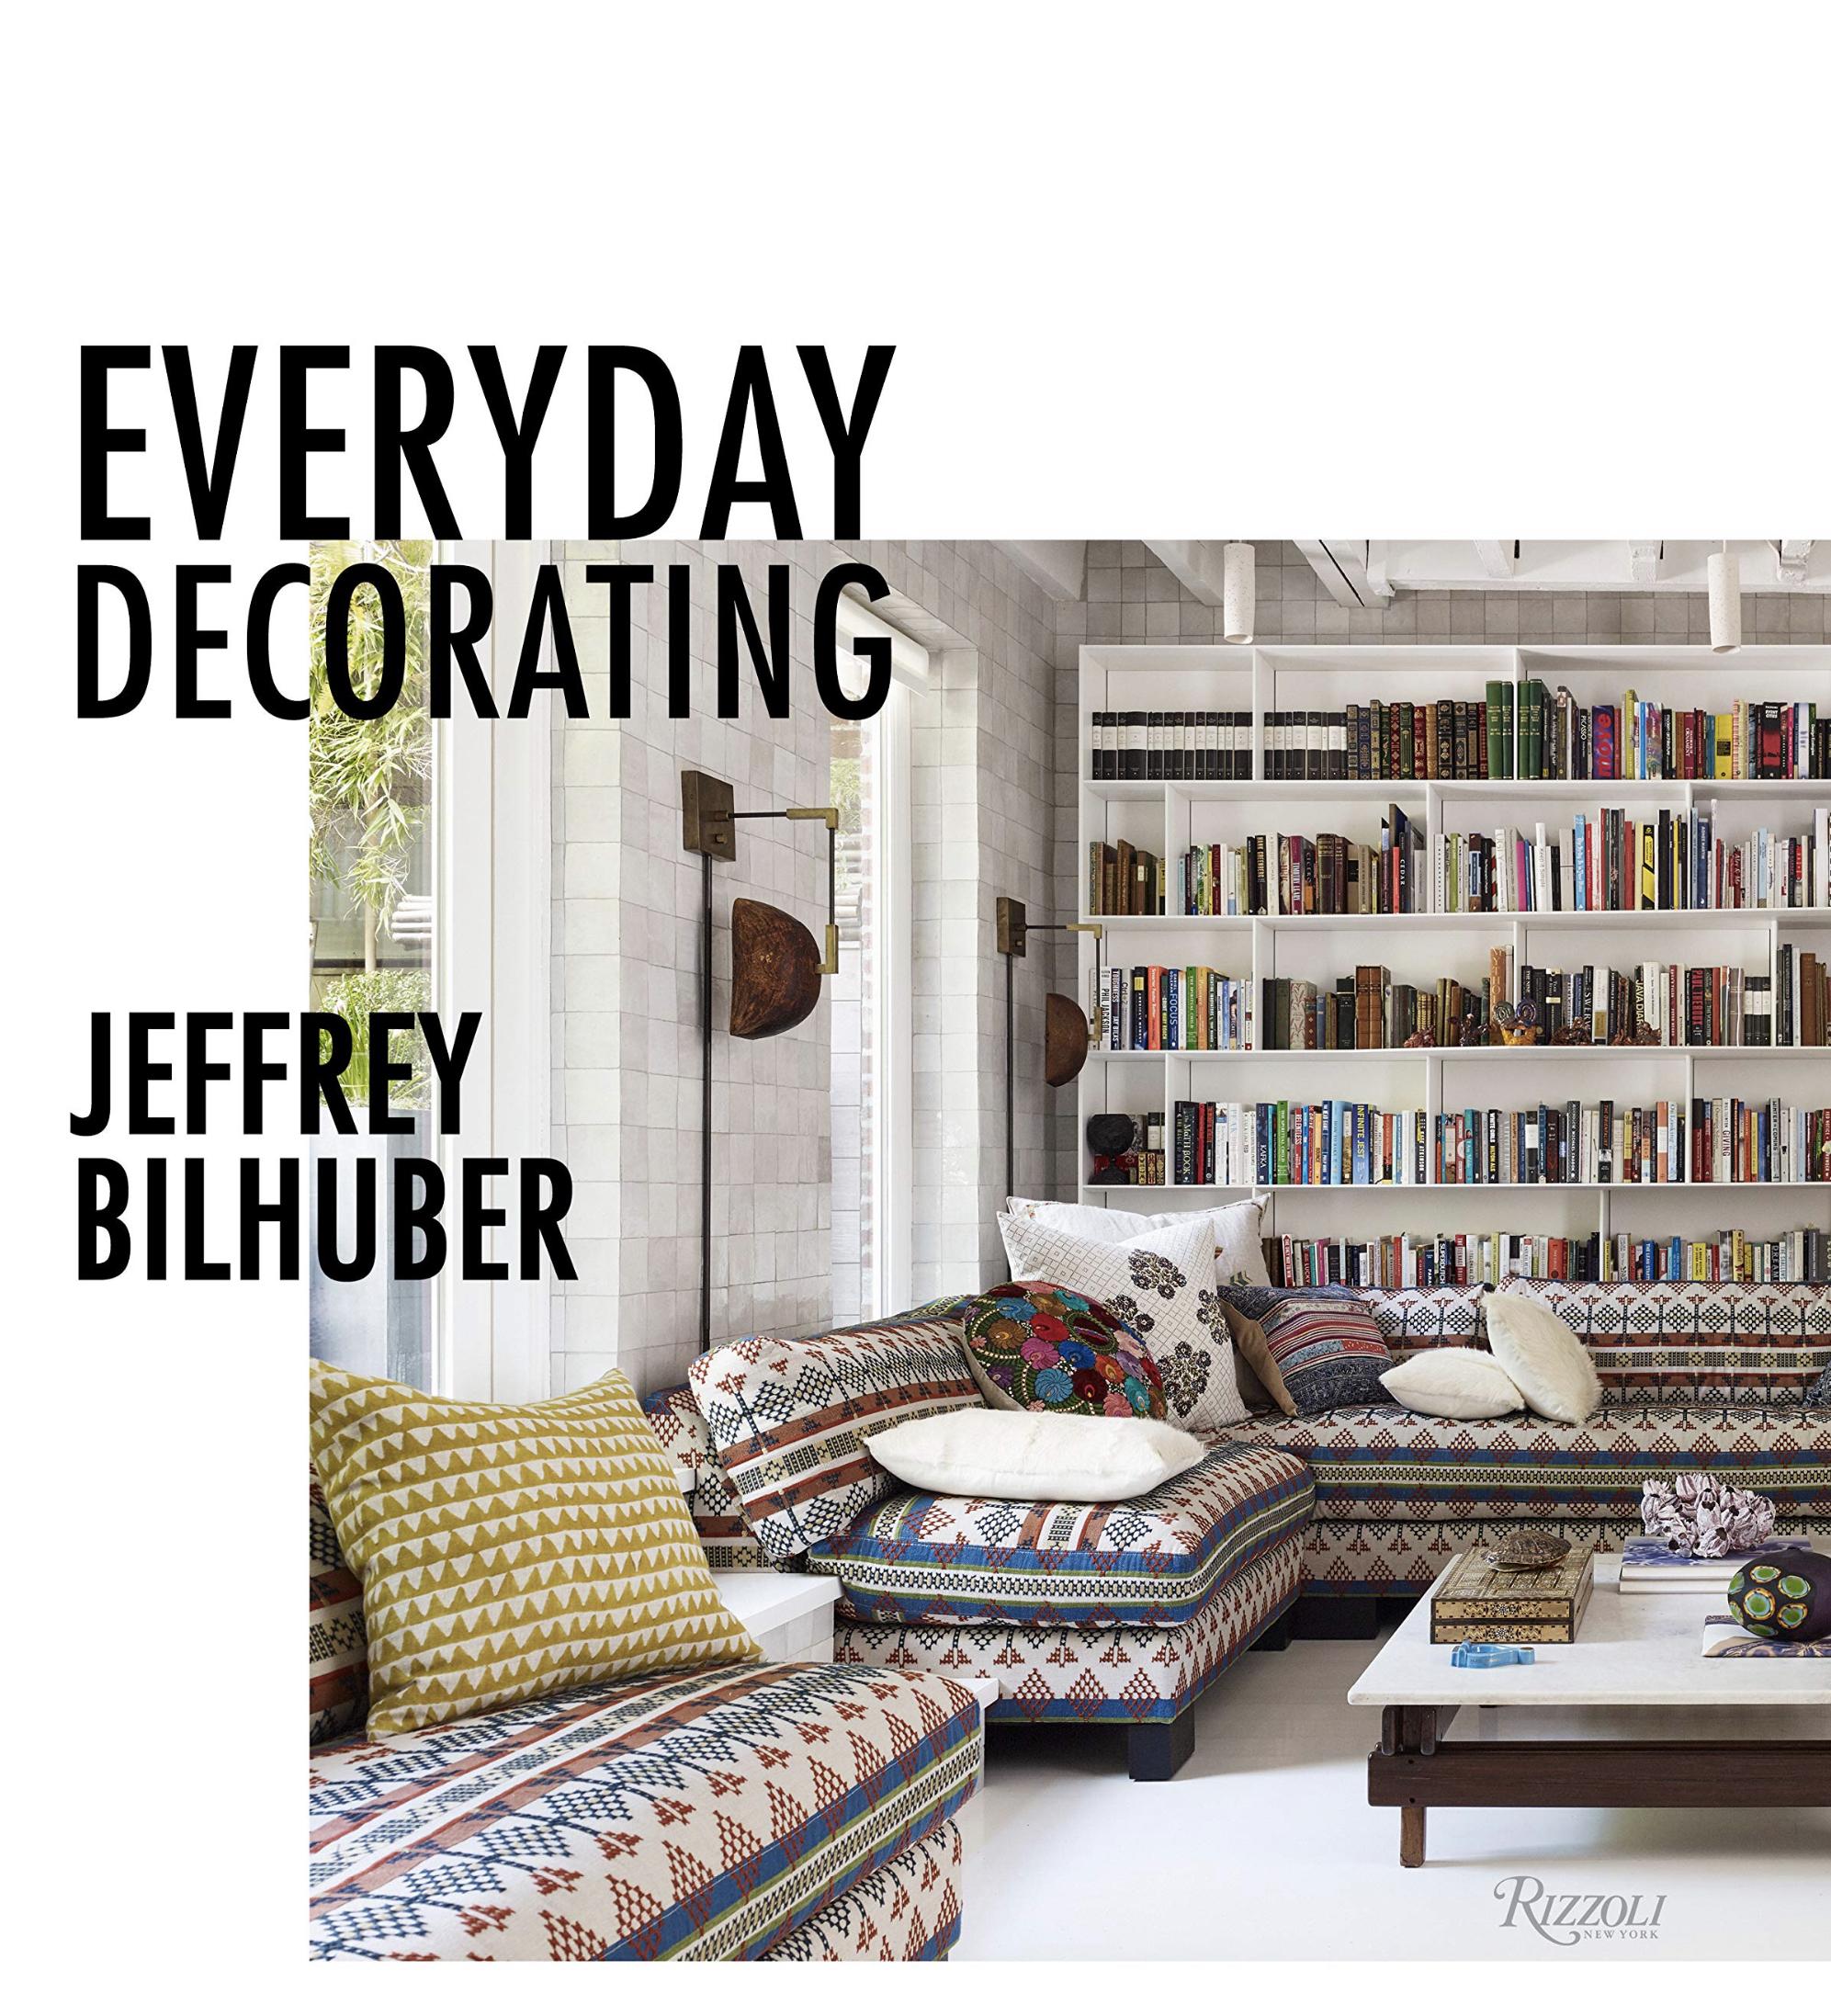 Everyday Decorating, Jeffrey Bilhuber; Rizzoli.